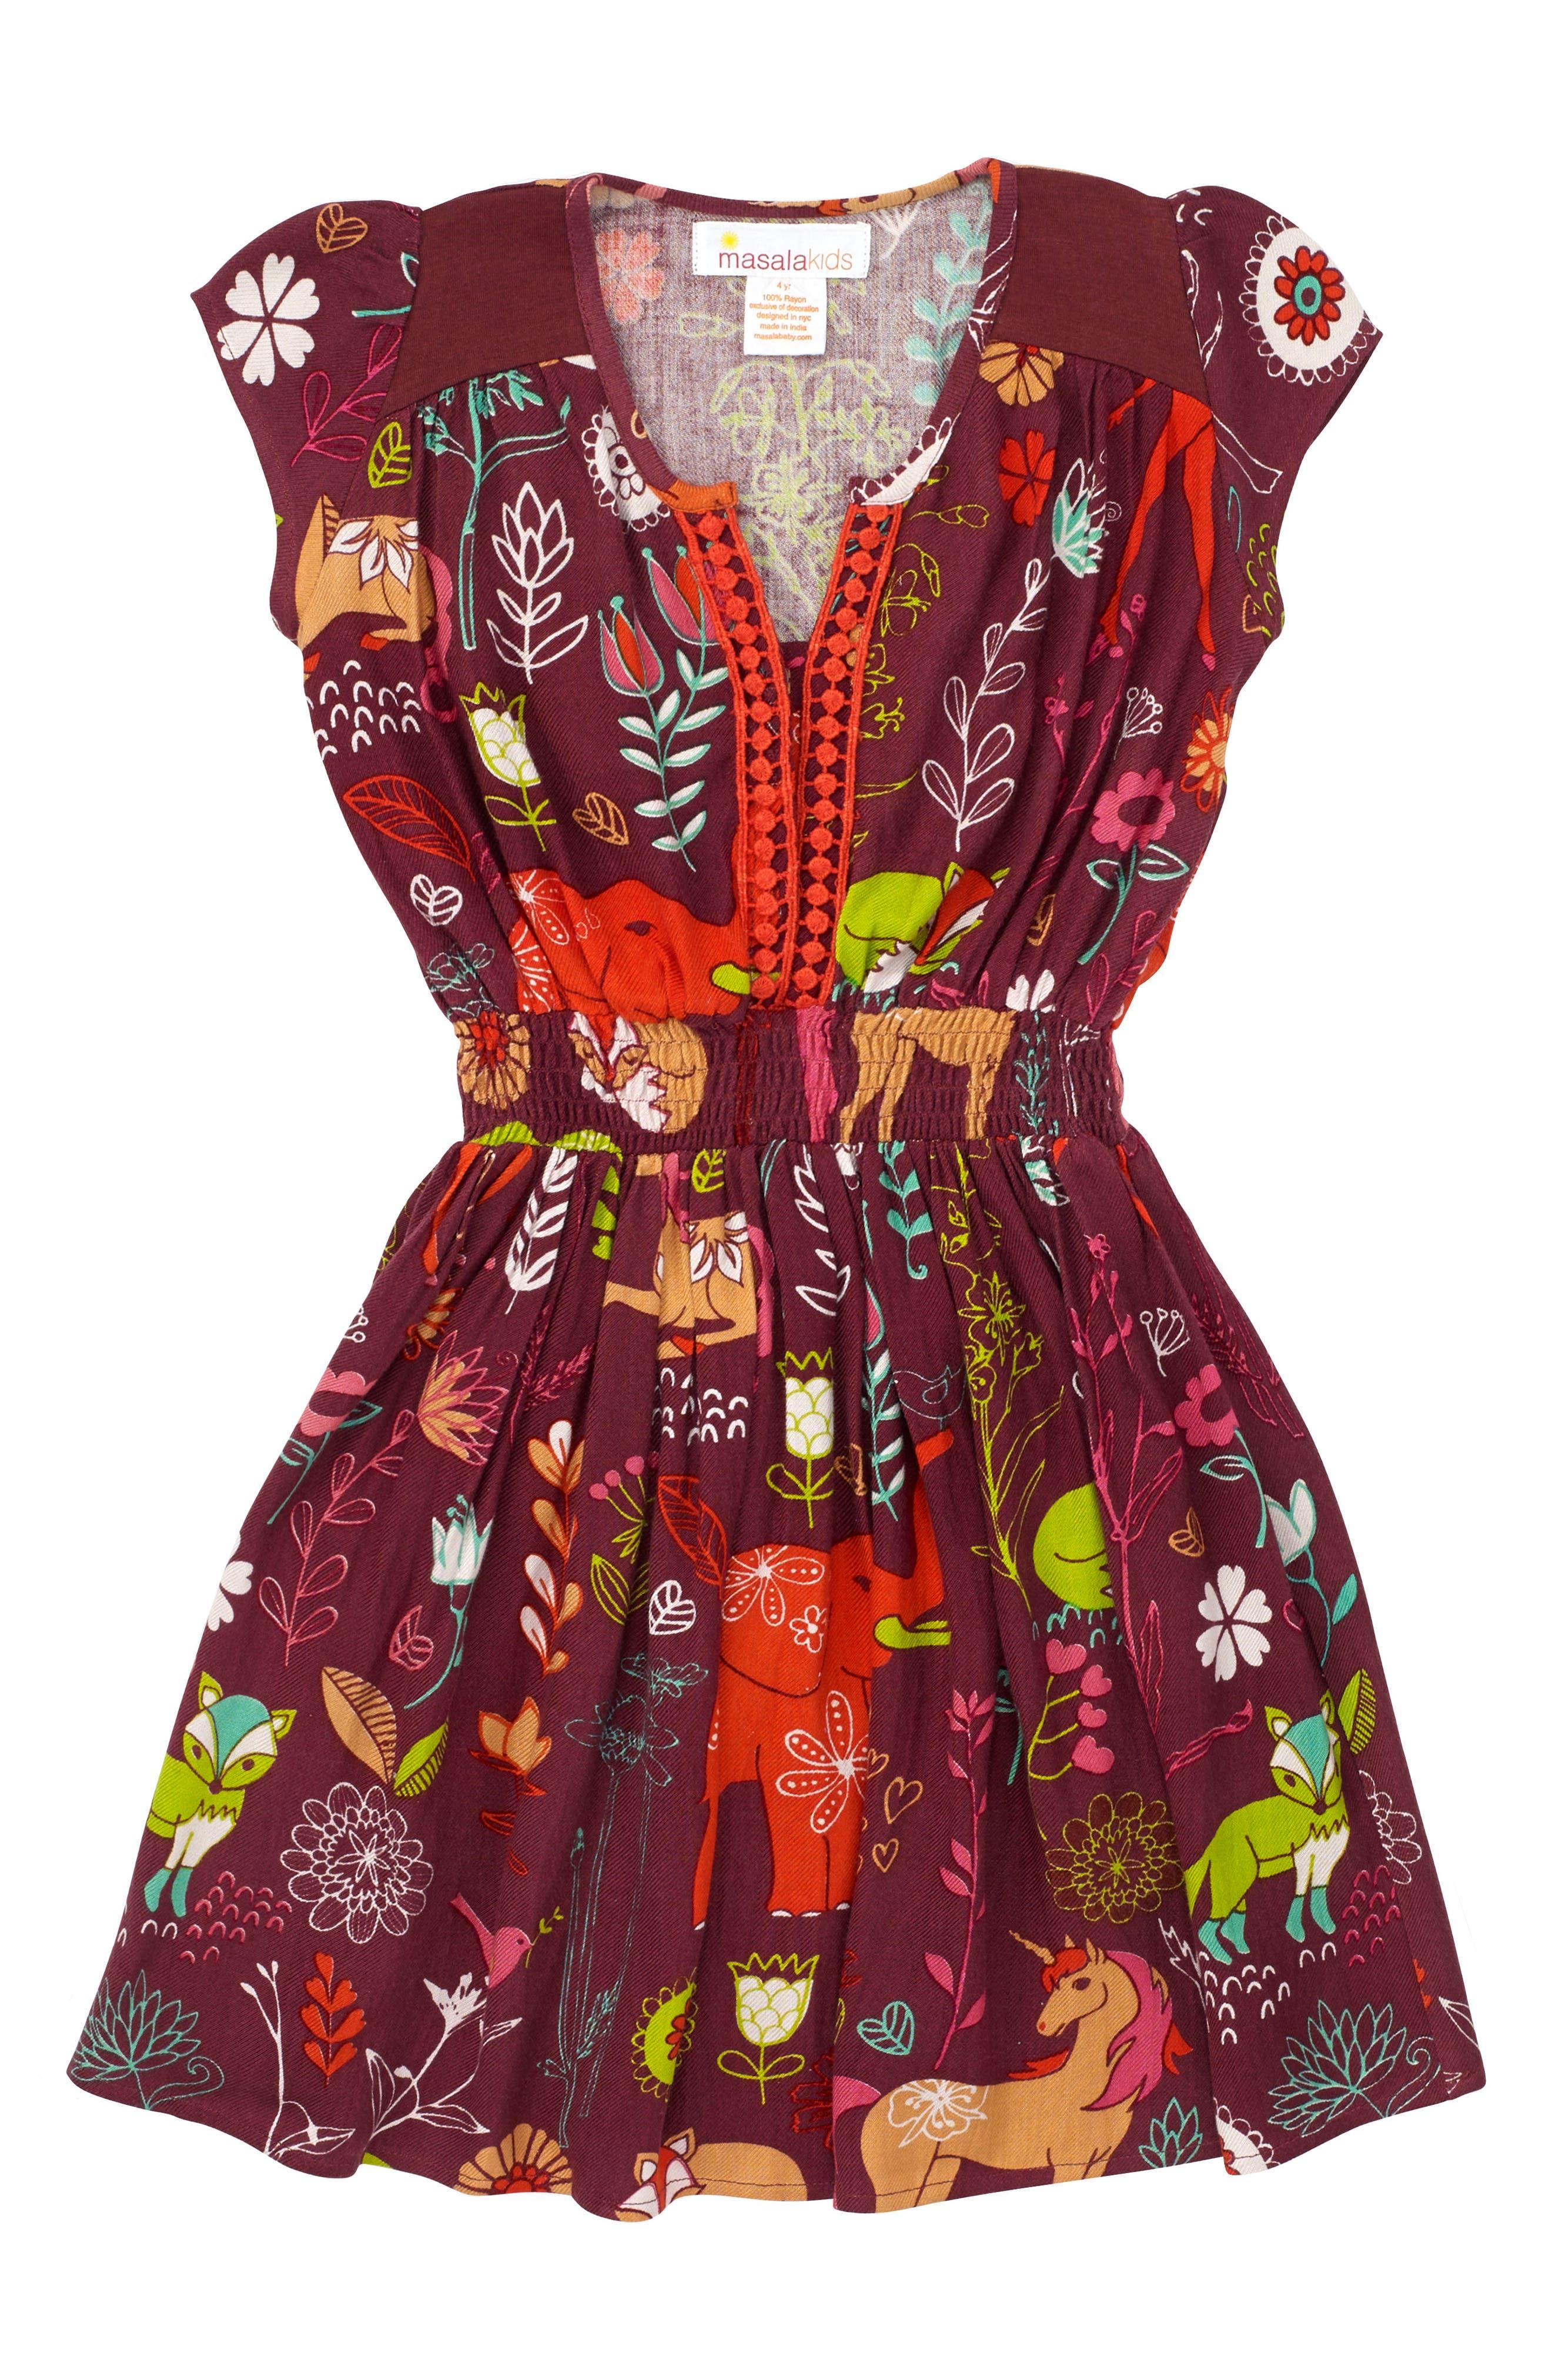 Alternate Image 1 Selected - Masalababy Magical Forest Dress (Toddler Girls, Little Girls & Big Girls)